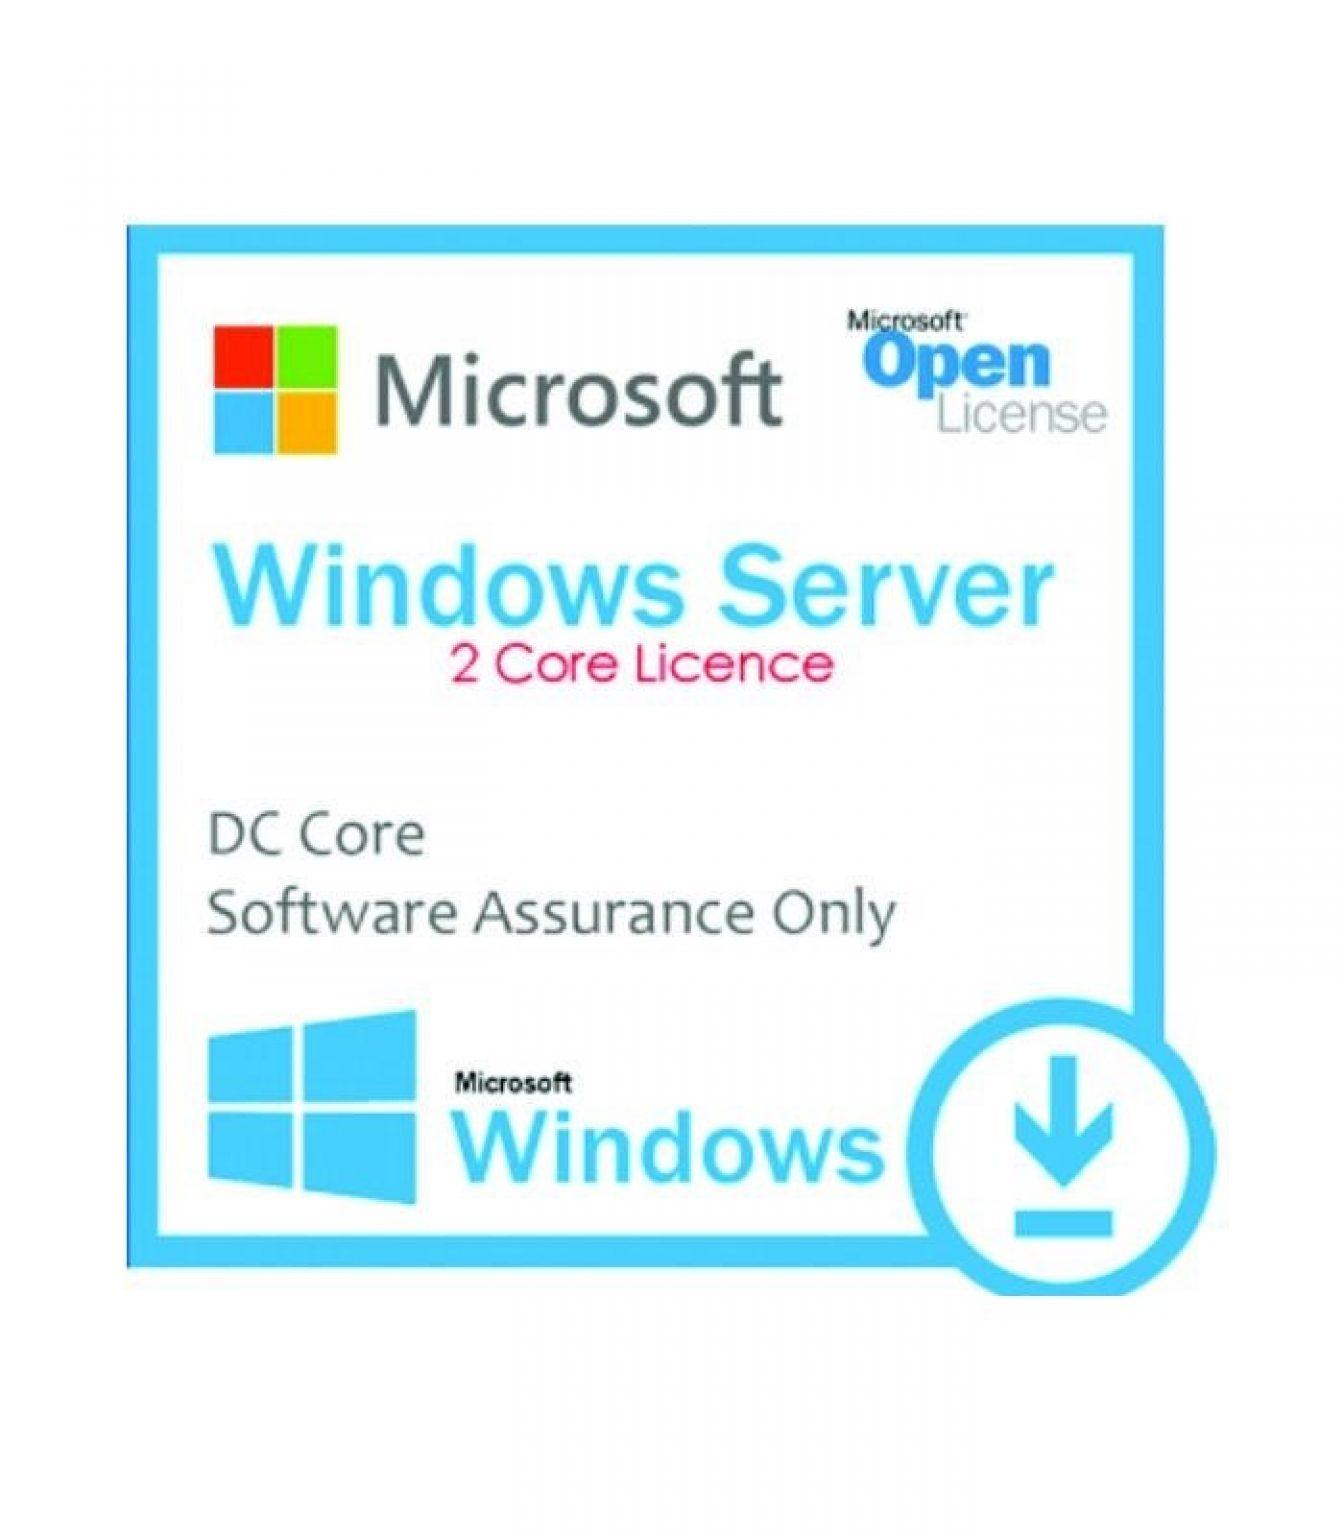 MICROSOFT - [Windows Server DC Core]WinSvrDCCore 2019 OLP 2Lic NL Gov CoreLic Qlfd[Pemerintah]